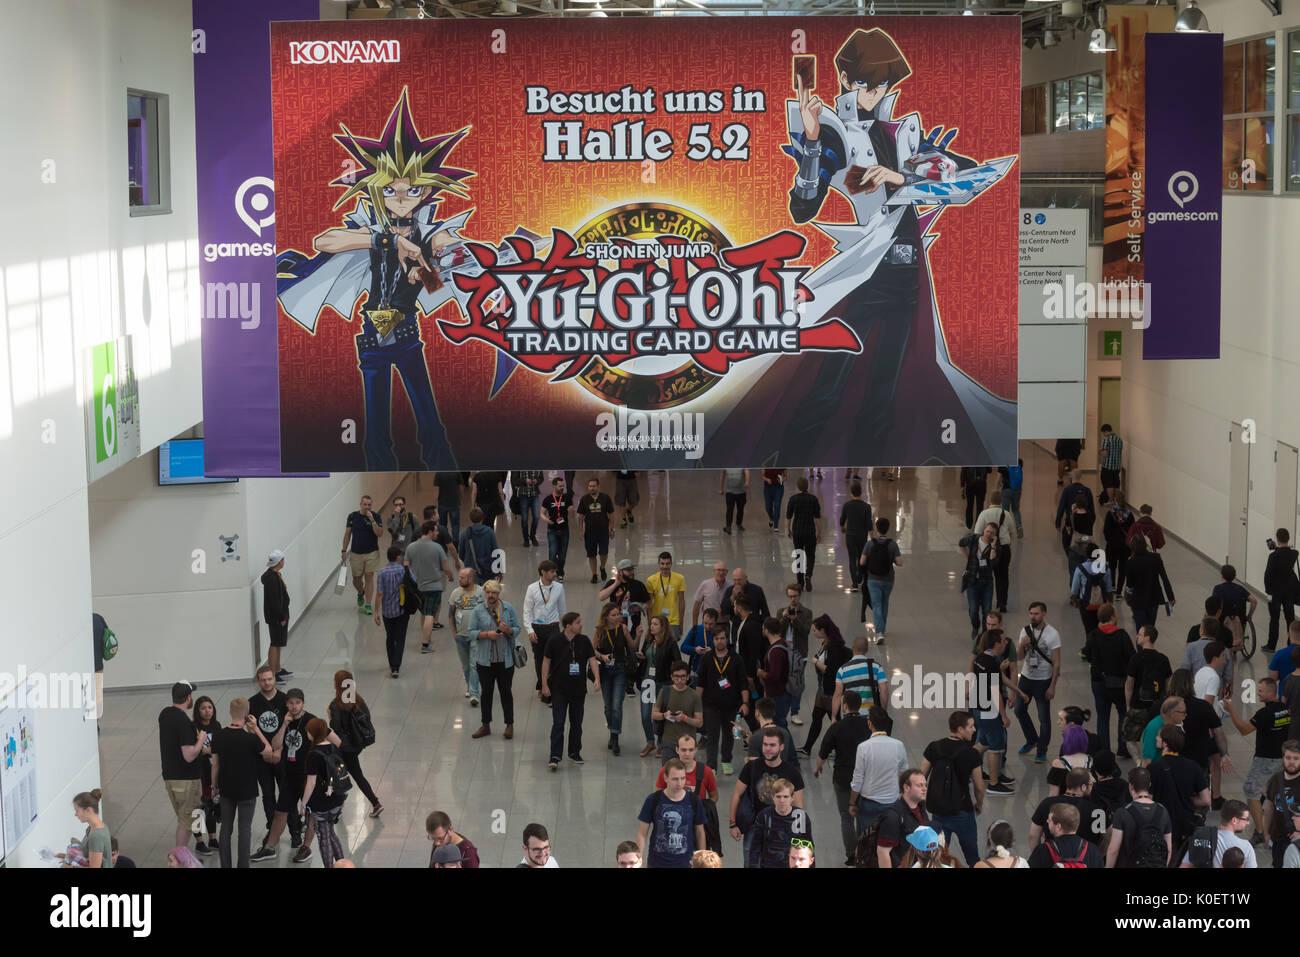 Cologne, Germany. 22nd Aug, 2017. Germany, Cologne, August 22, 2017, Gamescom: Visitors walk under Konami, yu-gi-oh, shonen jump. Credit: Juergen Schwarz/Alamy Live News - Stock Image